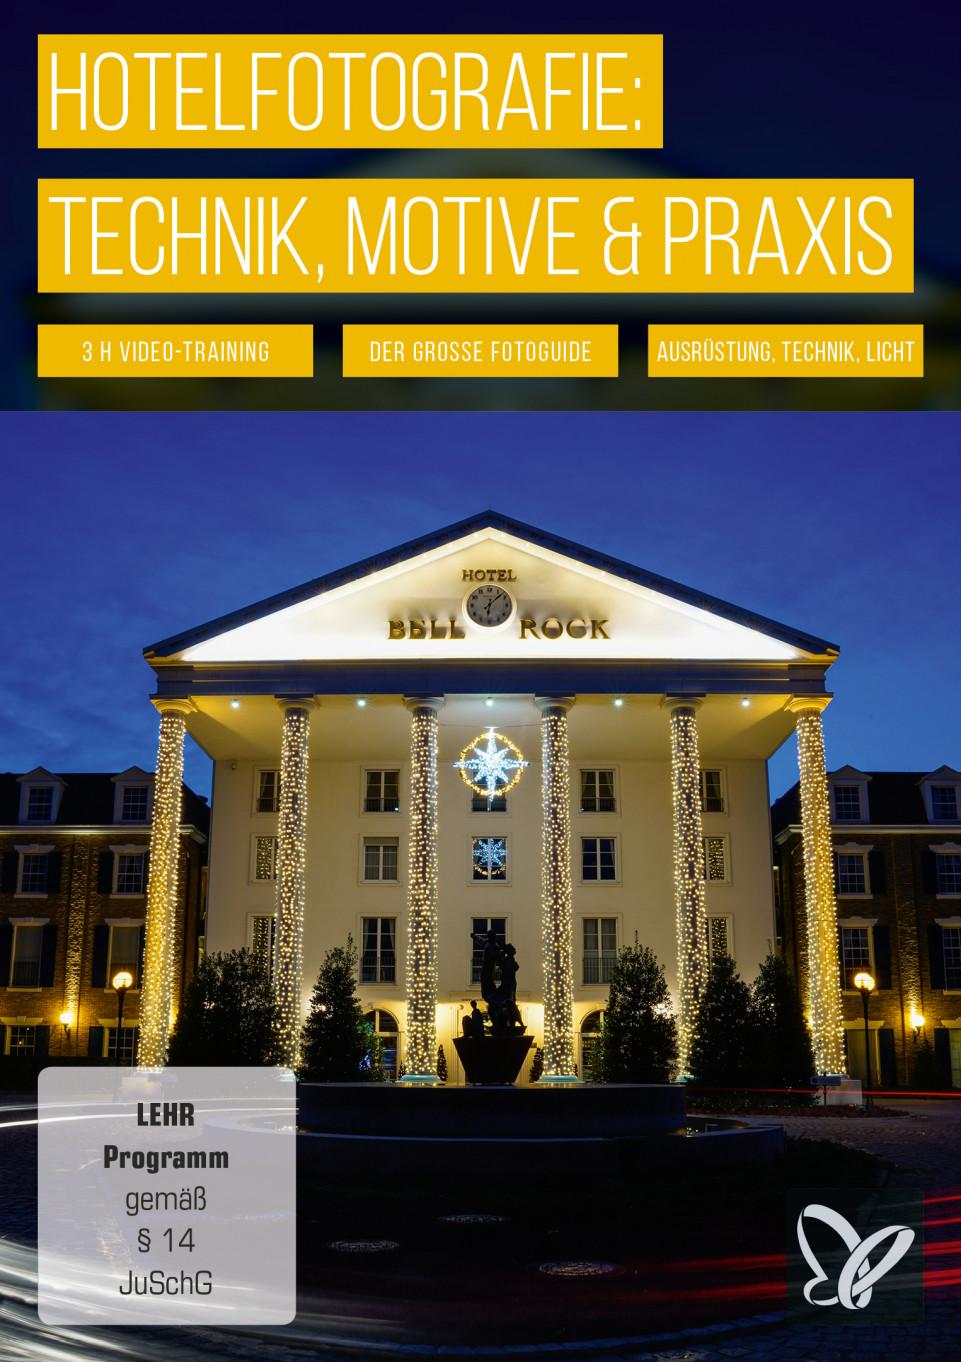 Hotelfotografie: Technik, Motive & Praxis